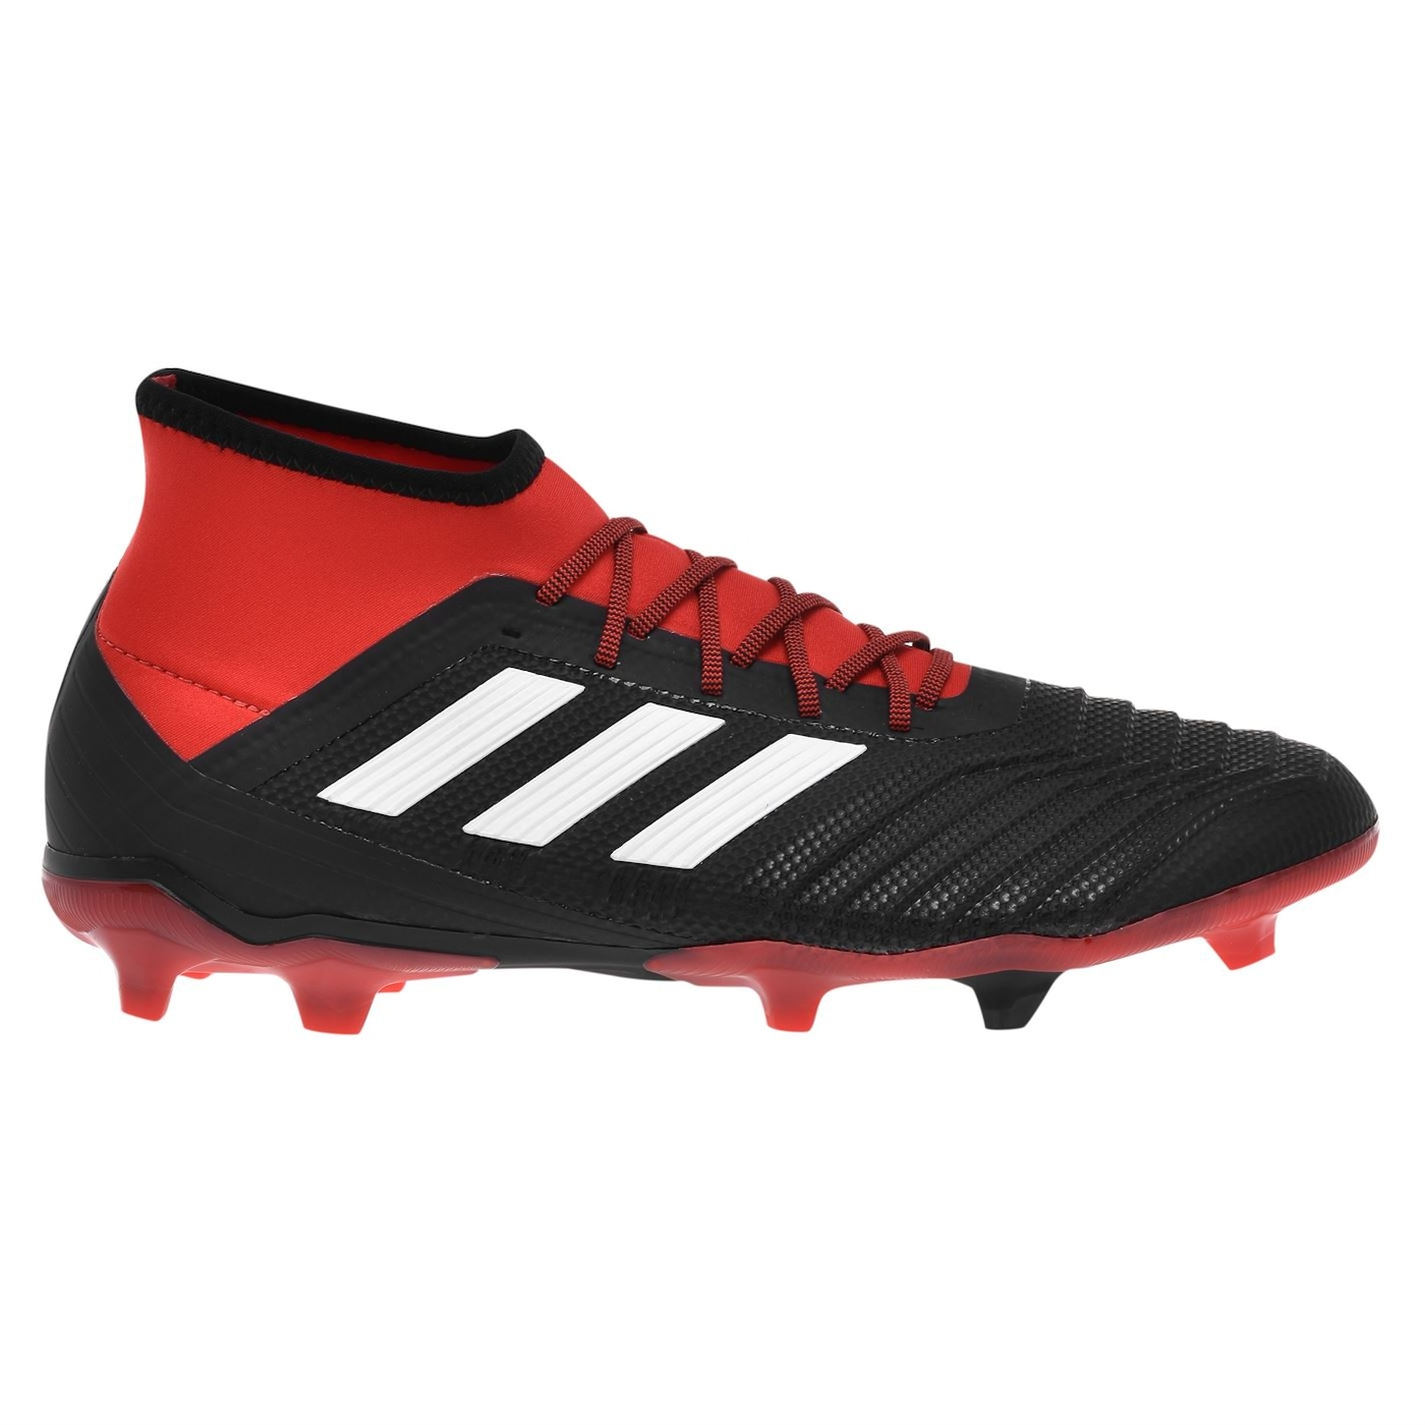 Adidas Predator 18.2 Mens FG Football Boots